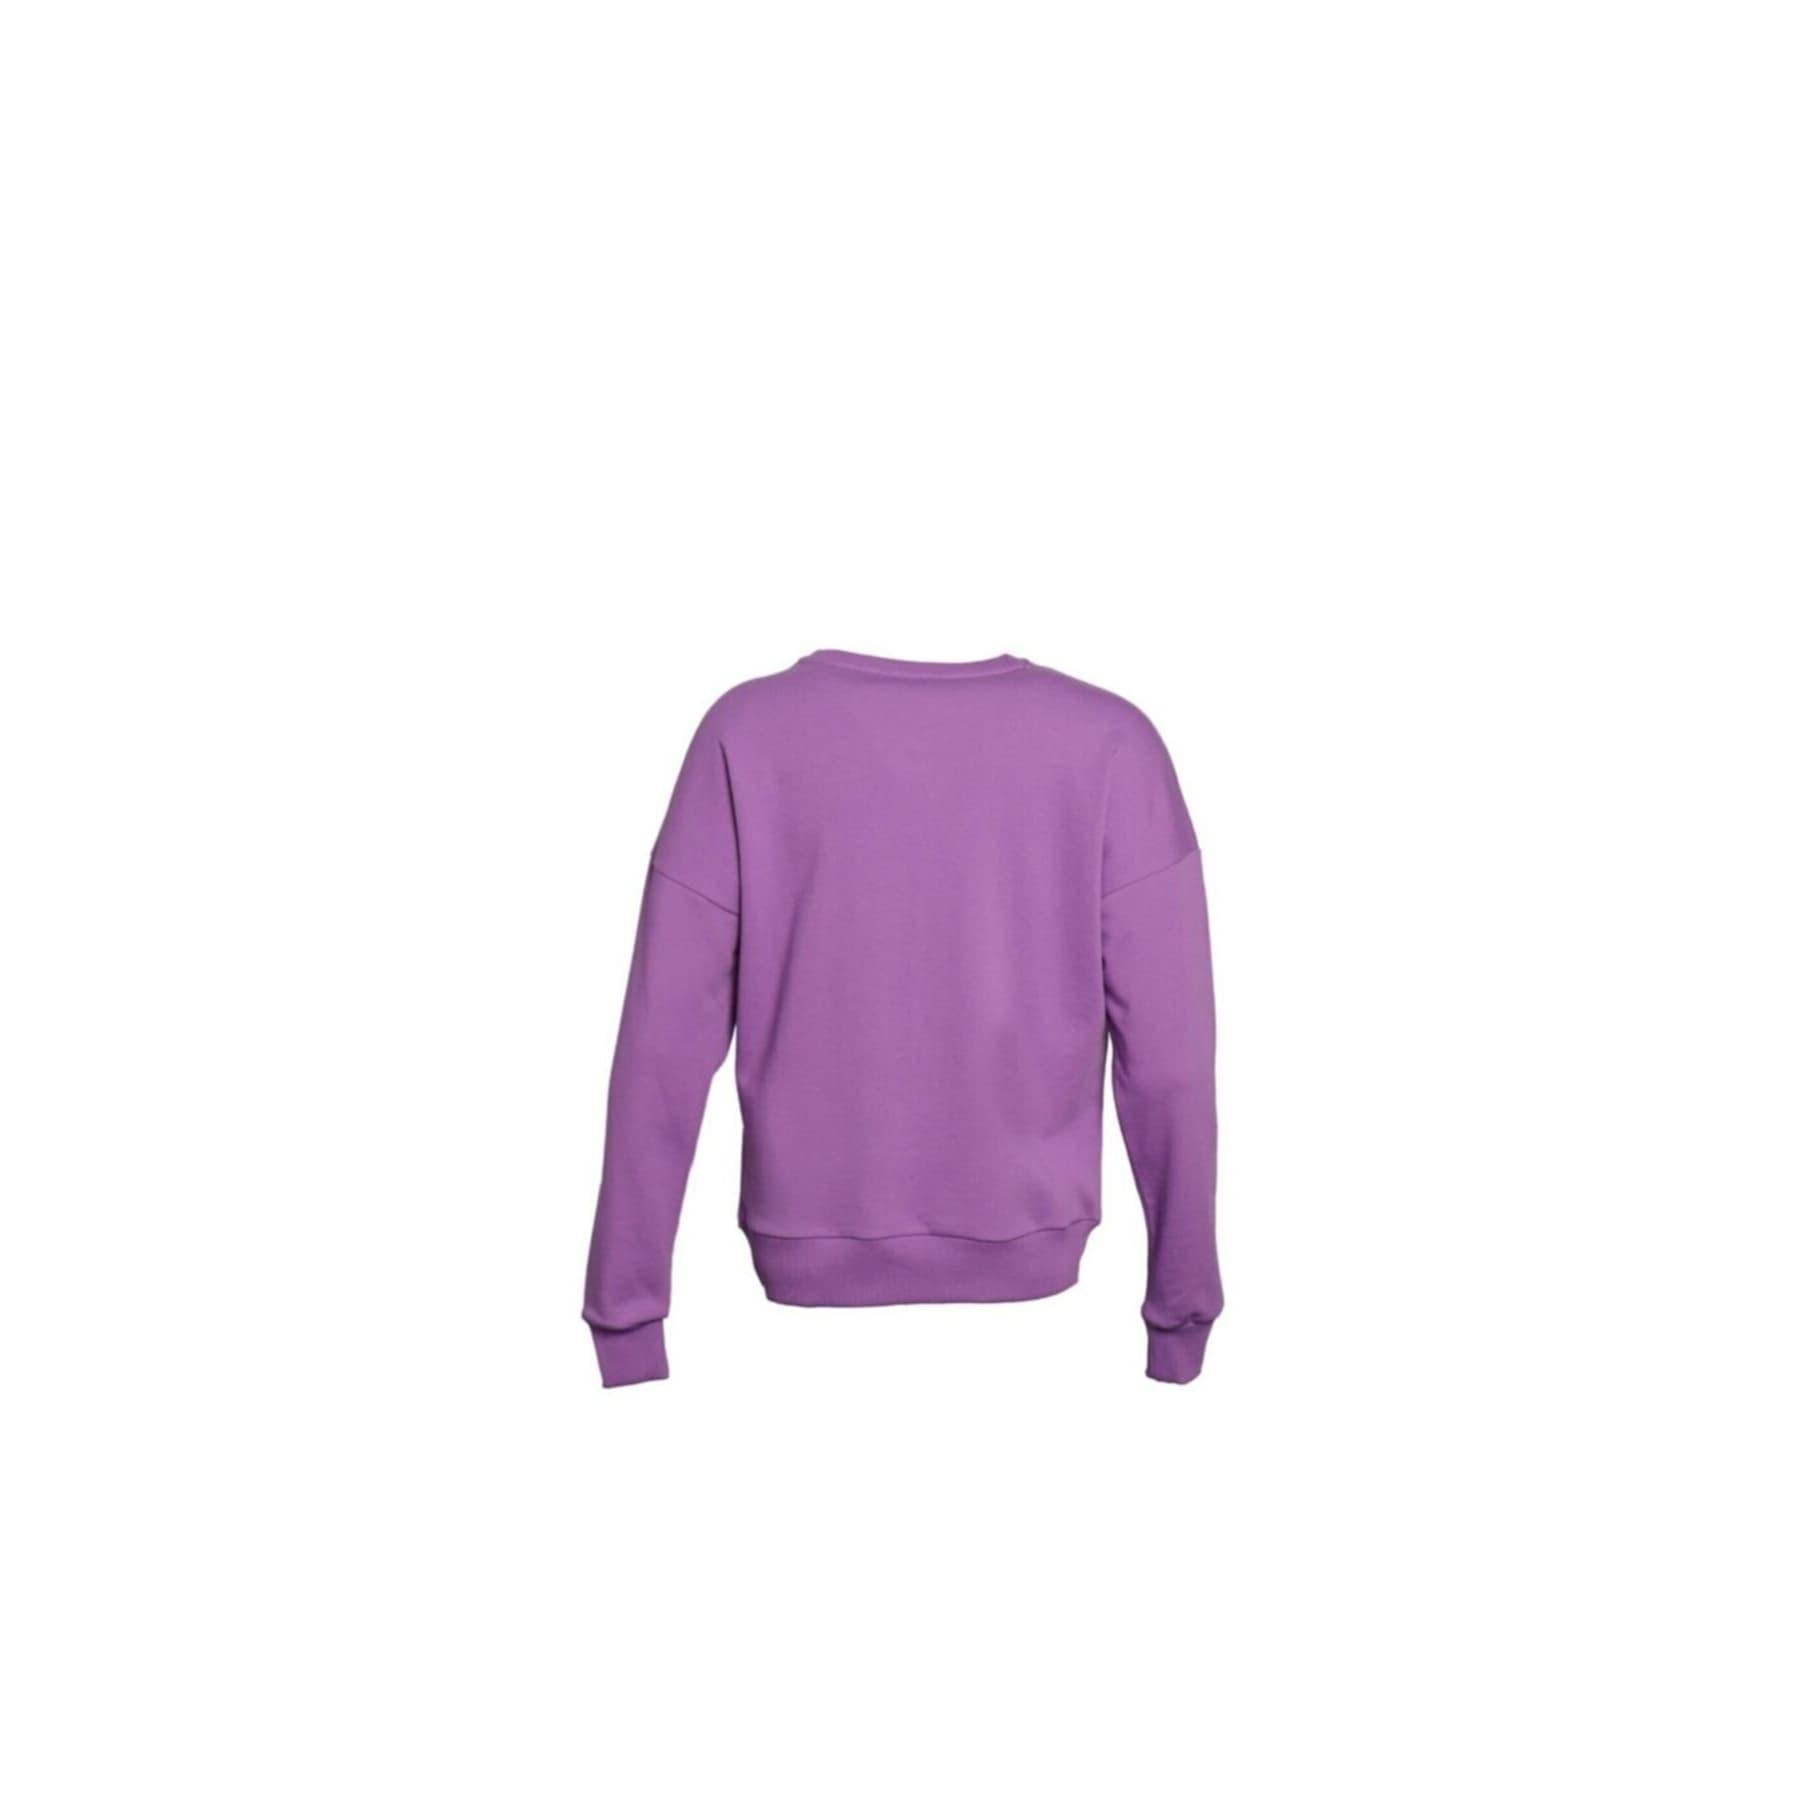 Hummel Naomi Kadın Mor Sweatshirt (921113-1317)